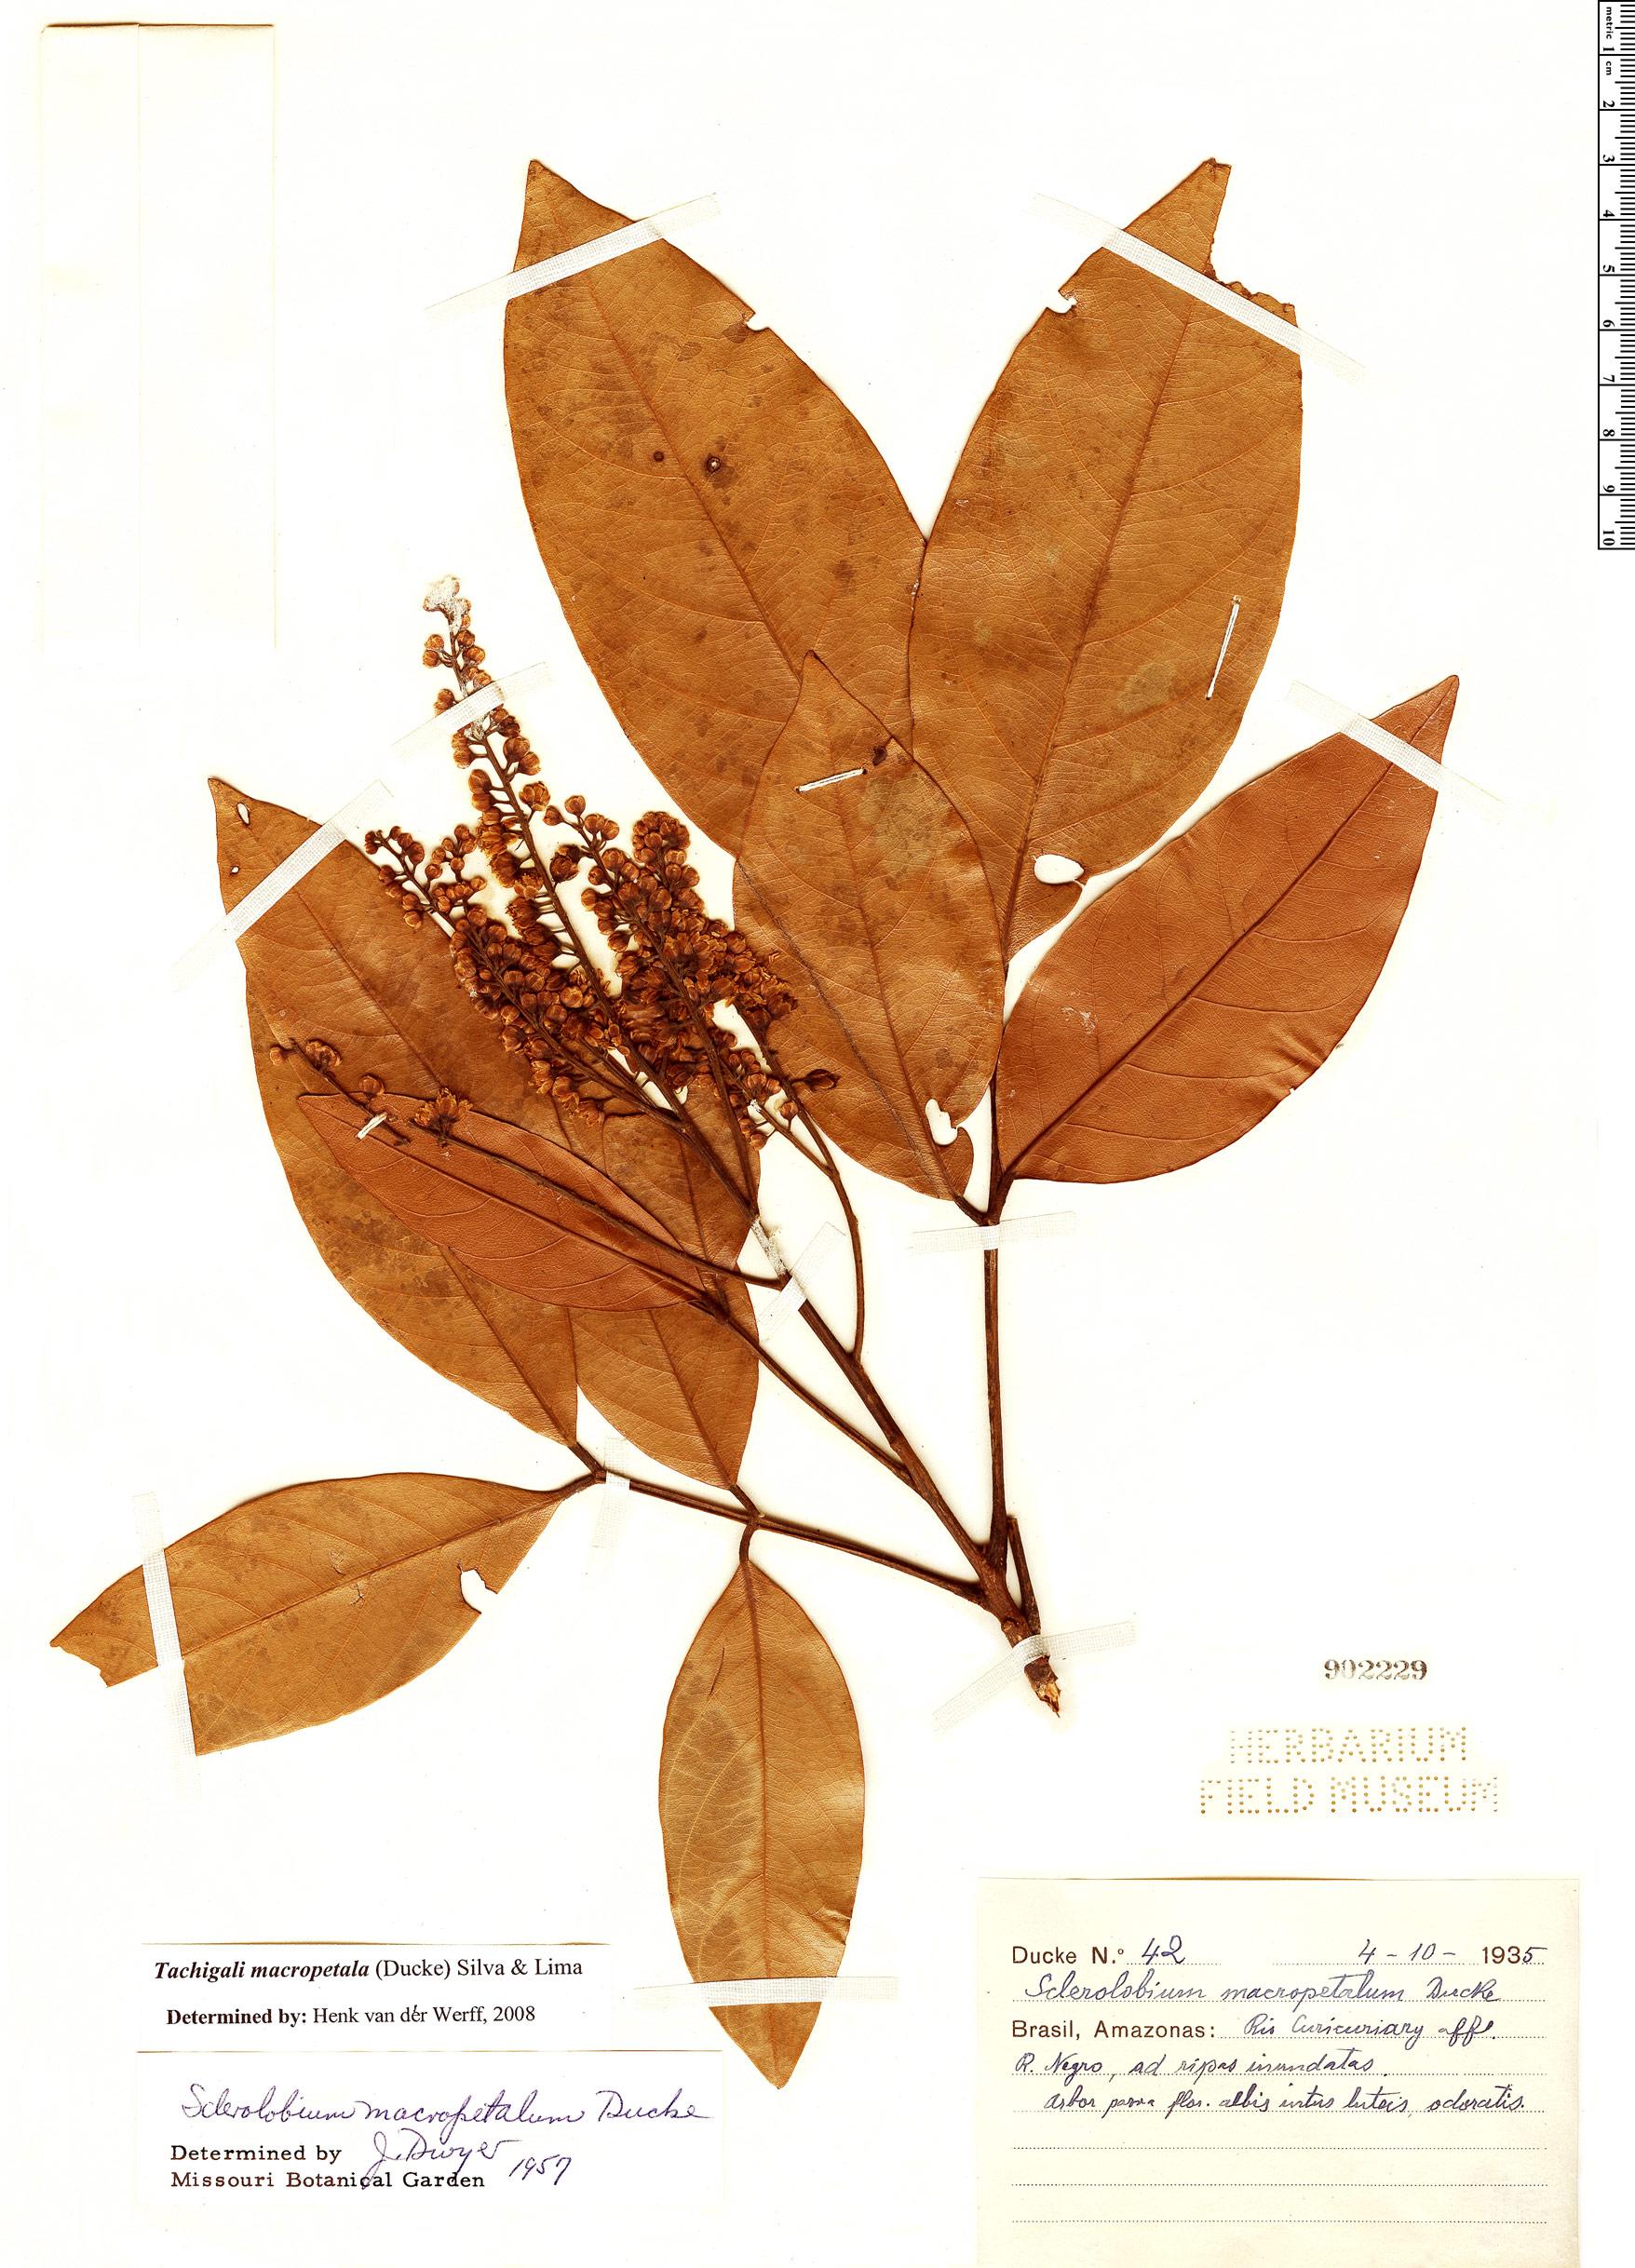 Specimen: Tachigali macropetala